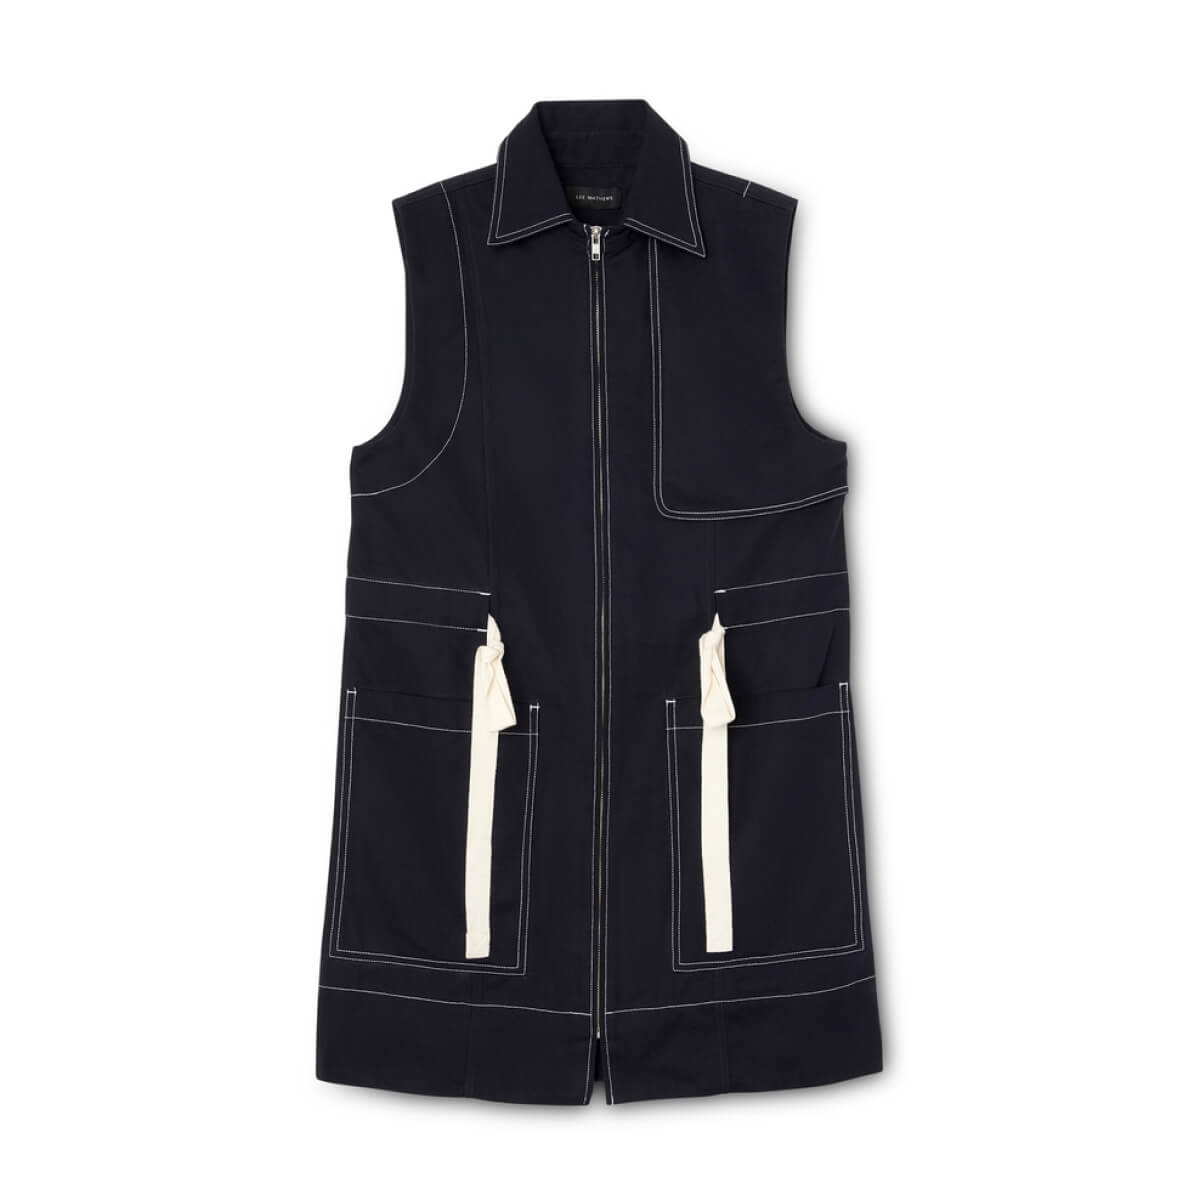 Lee Mathews vest